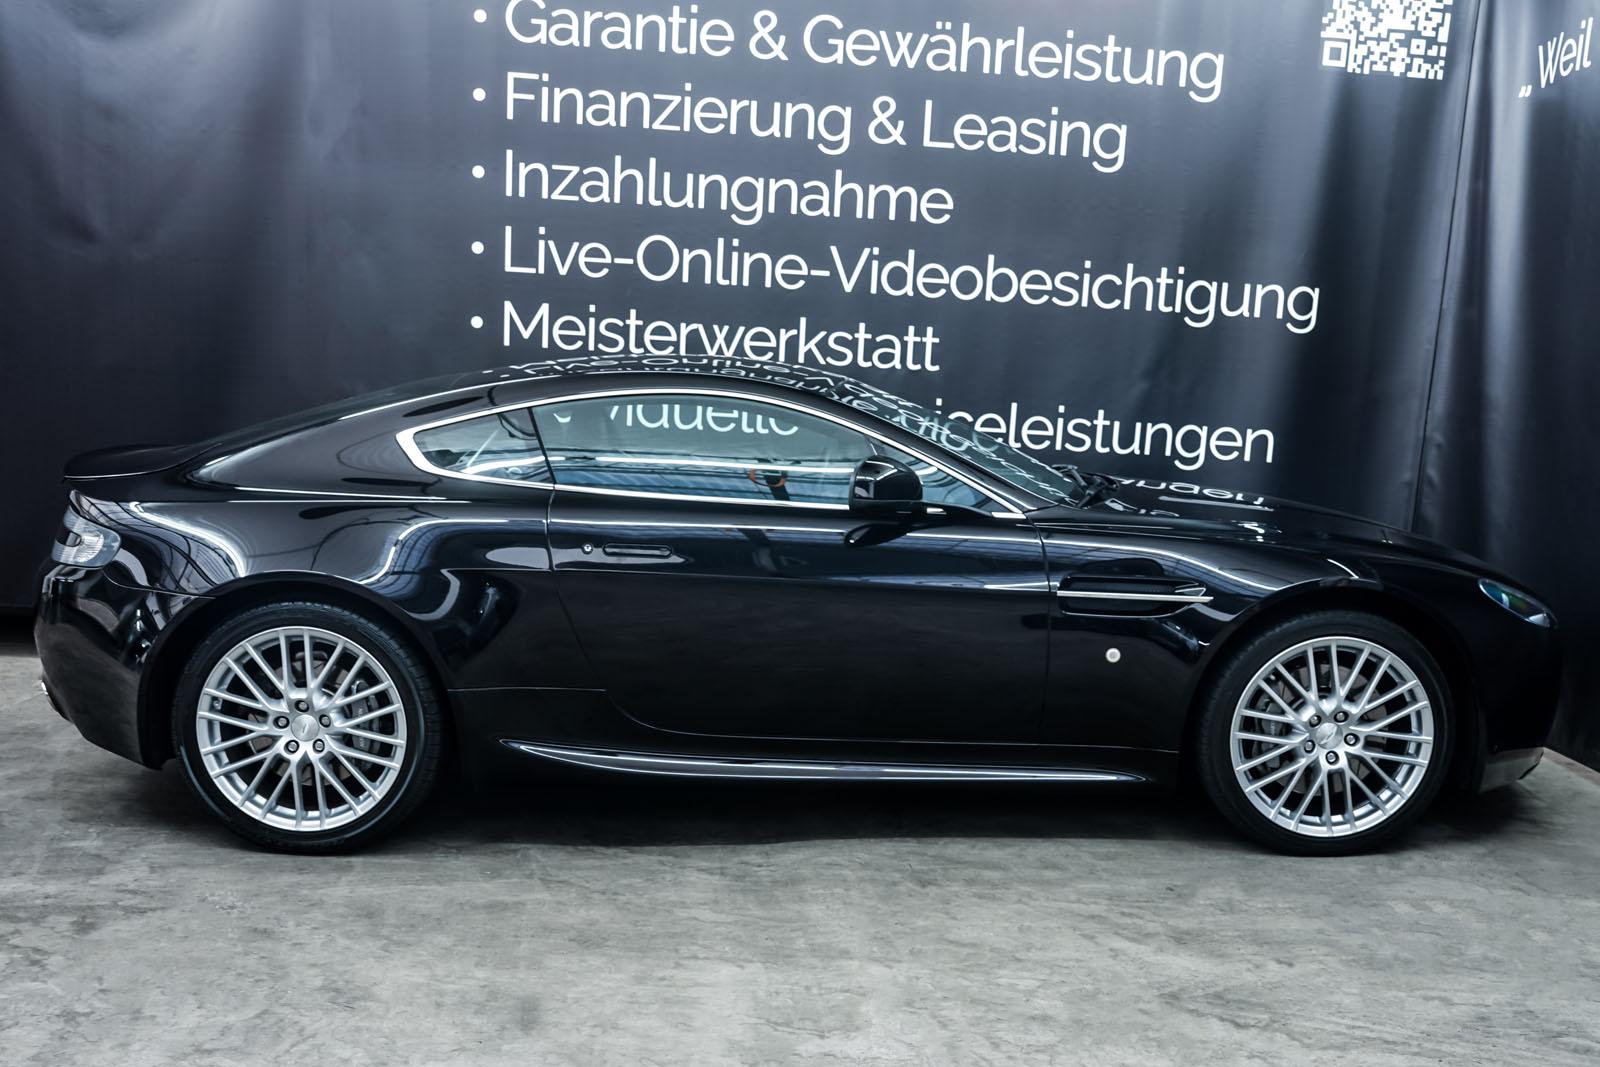 AstonMartin_V8_Vantage_Schwarz_Schwarz_AM-5679_14_w